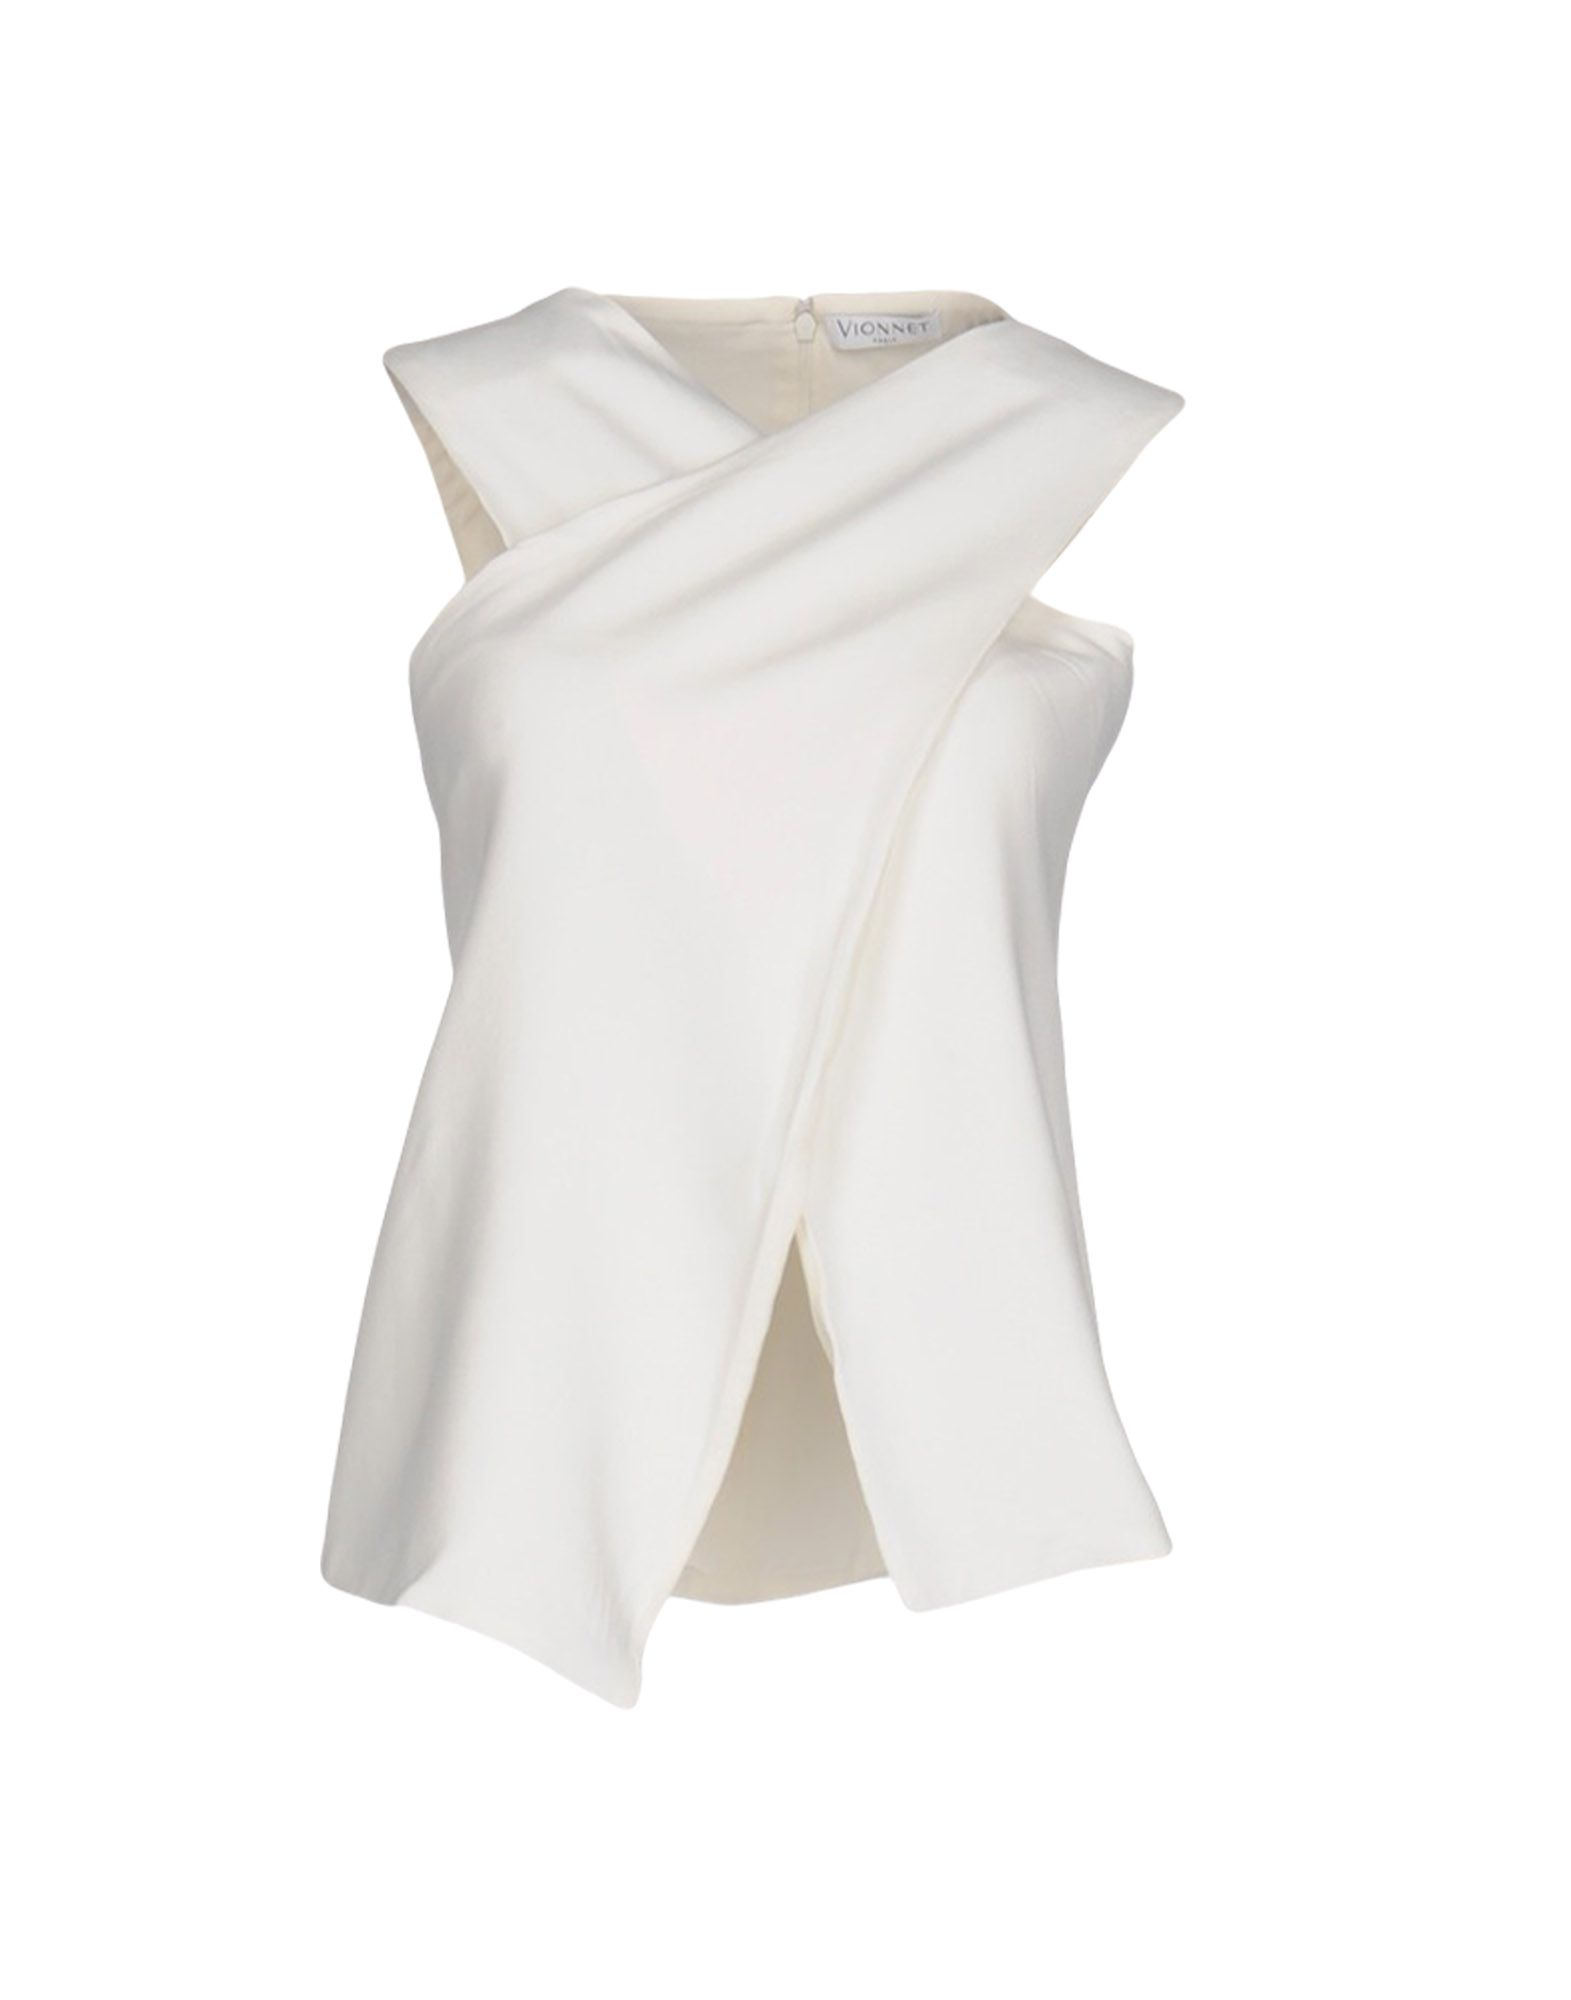 VIONNET Топ без рукавов vionnet vionnet платье из шелка sf 145254